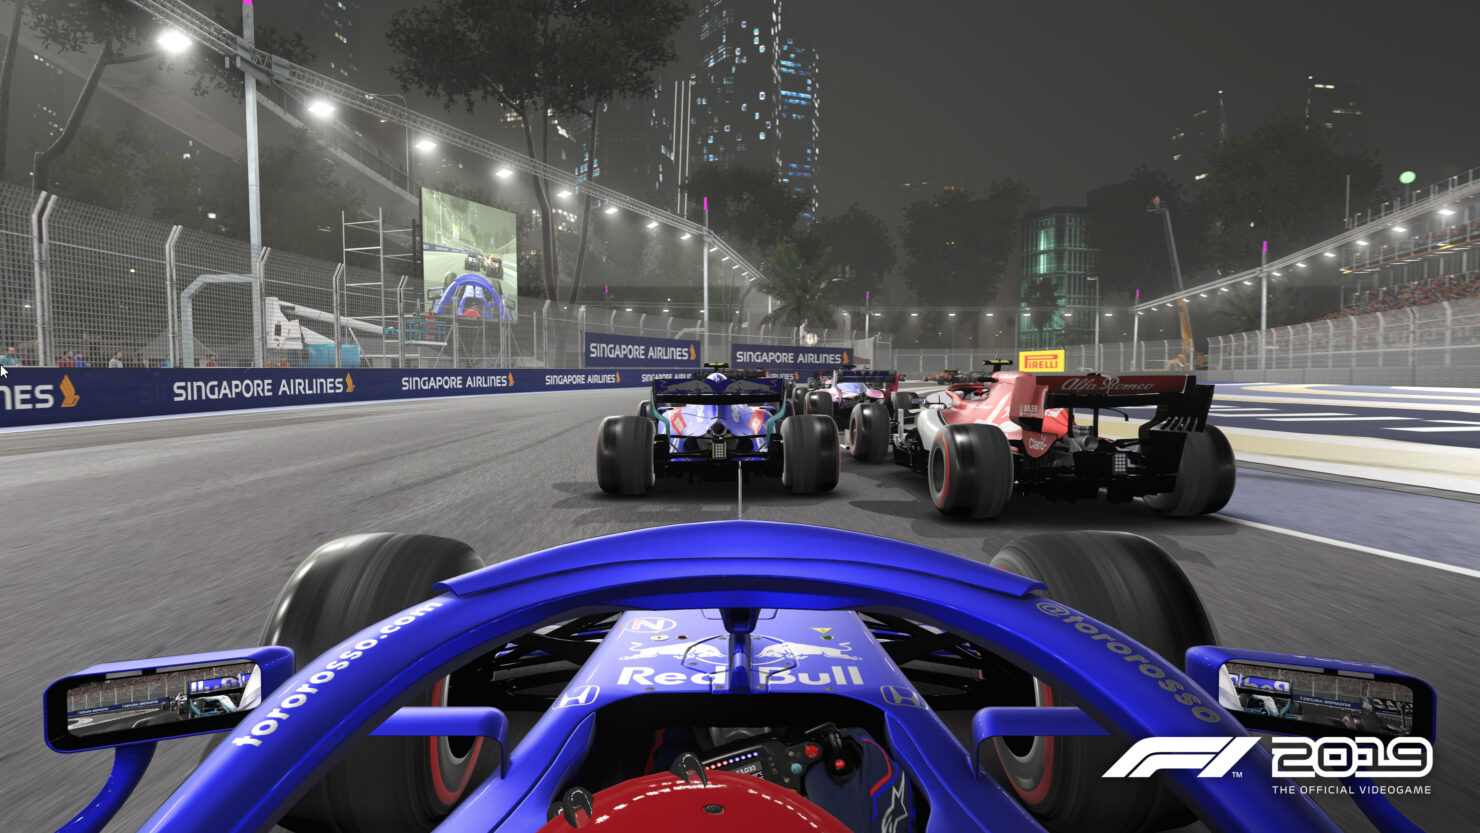 f1-2019-night-lighting-comparison-03-part-2-singapore-2019-01